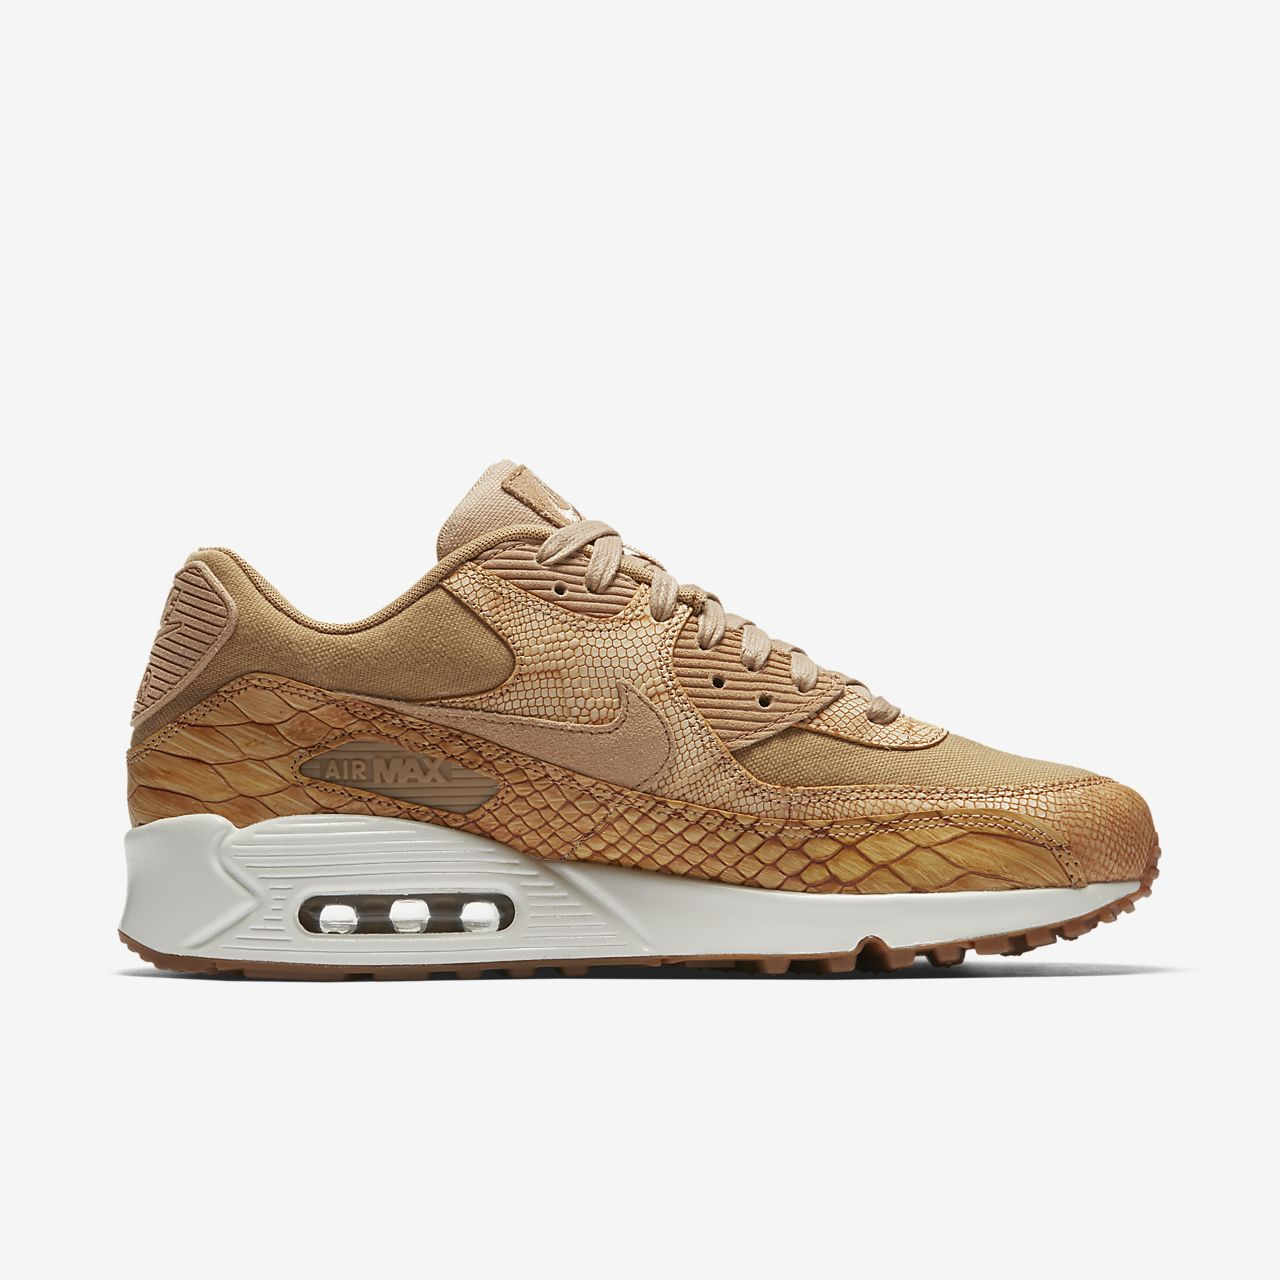 timeless design 4e5f1 d58f2 nike air max 90 snake skin sneakers